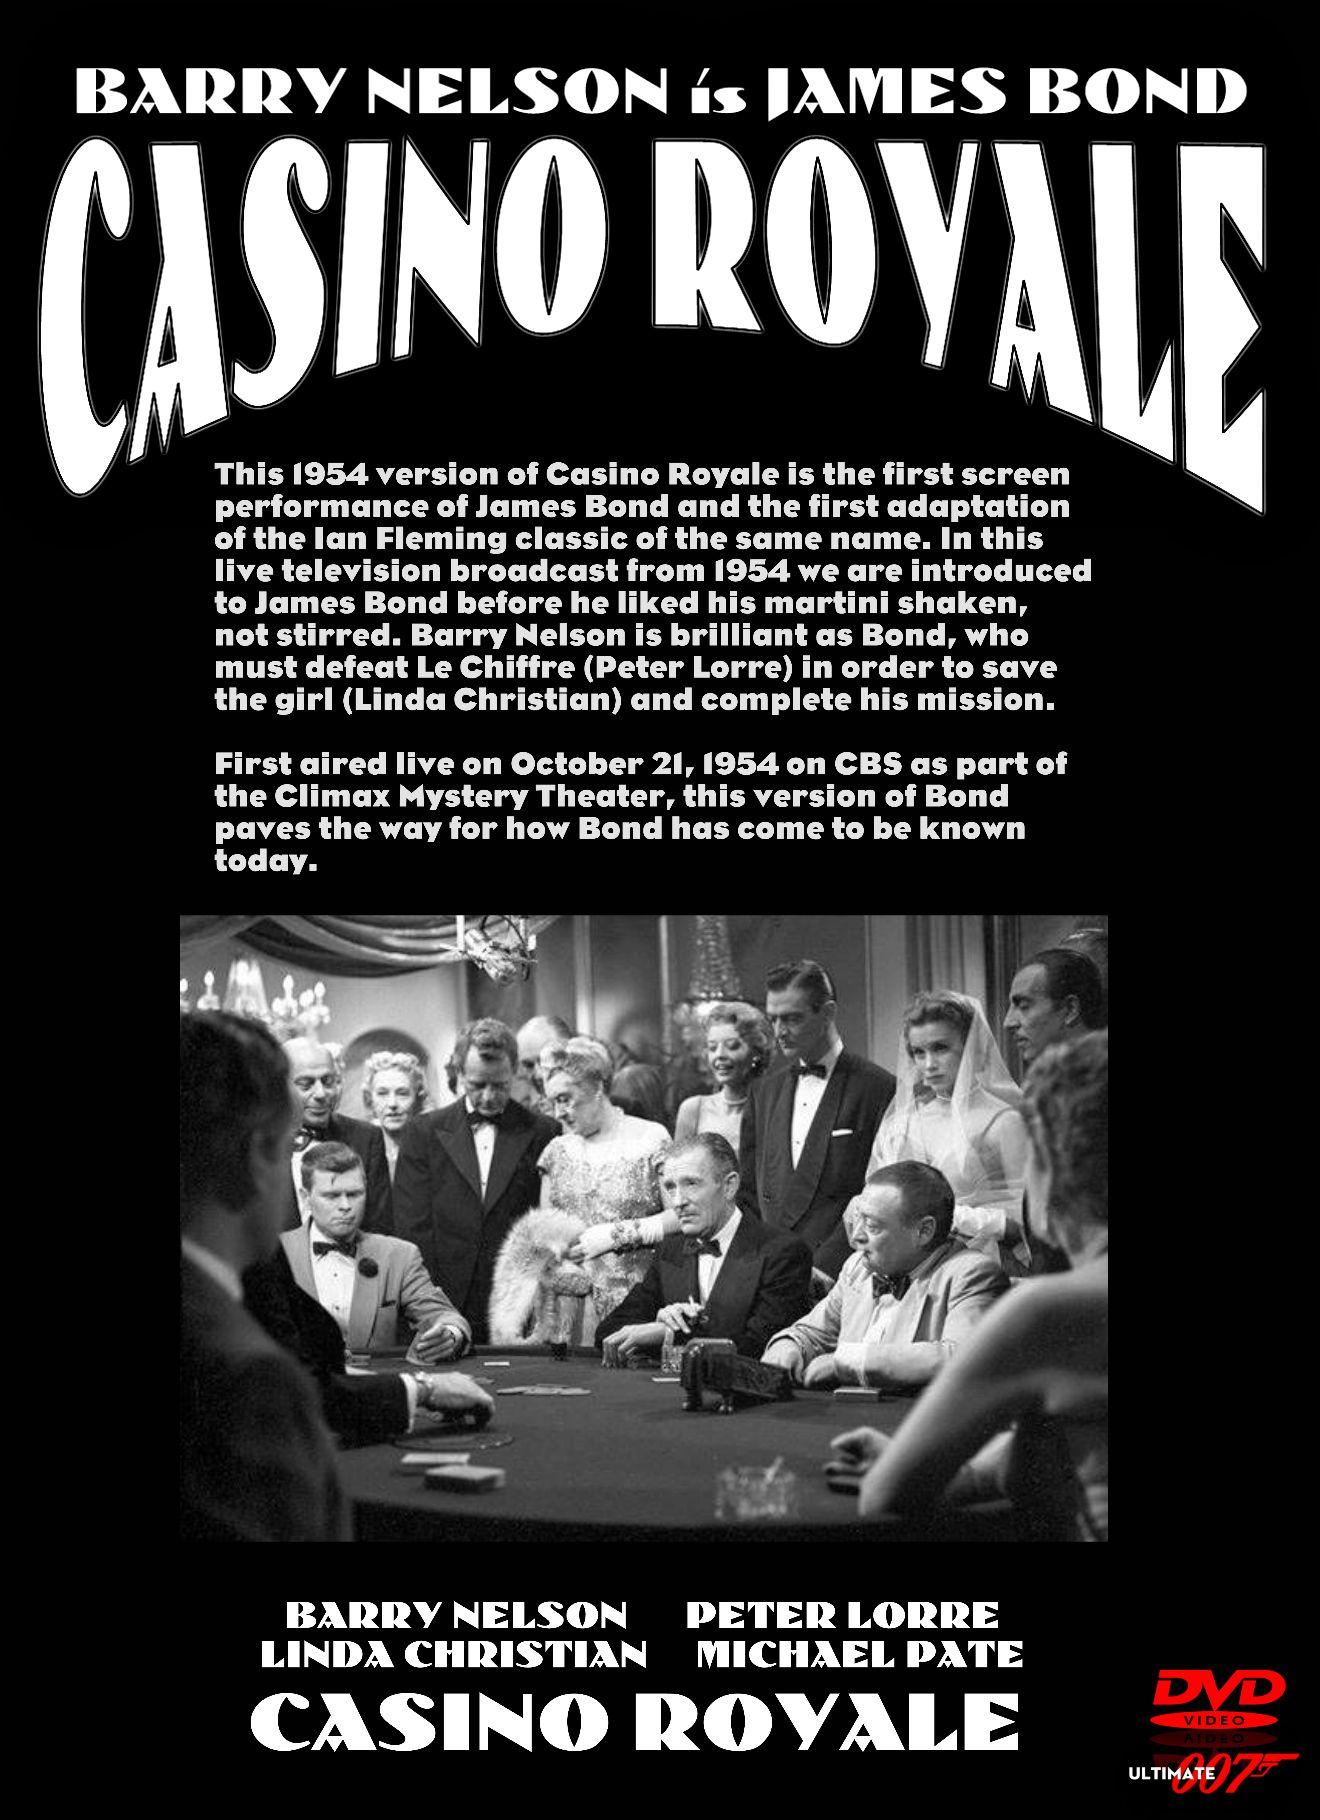 CASINO ROYALE (1954) DVD #IanFleming #007 #JamesBond | JAMES BOND by